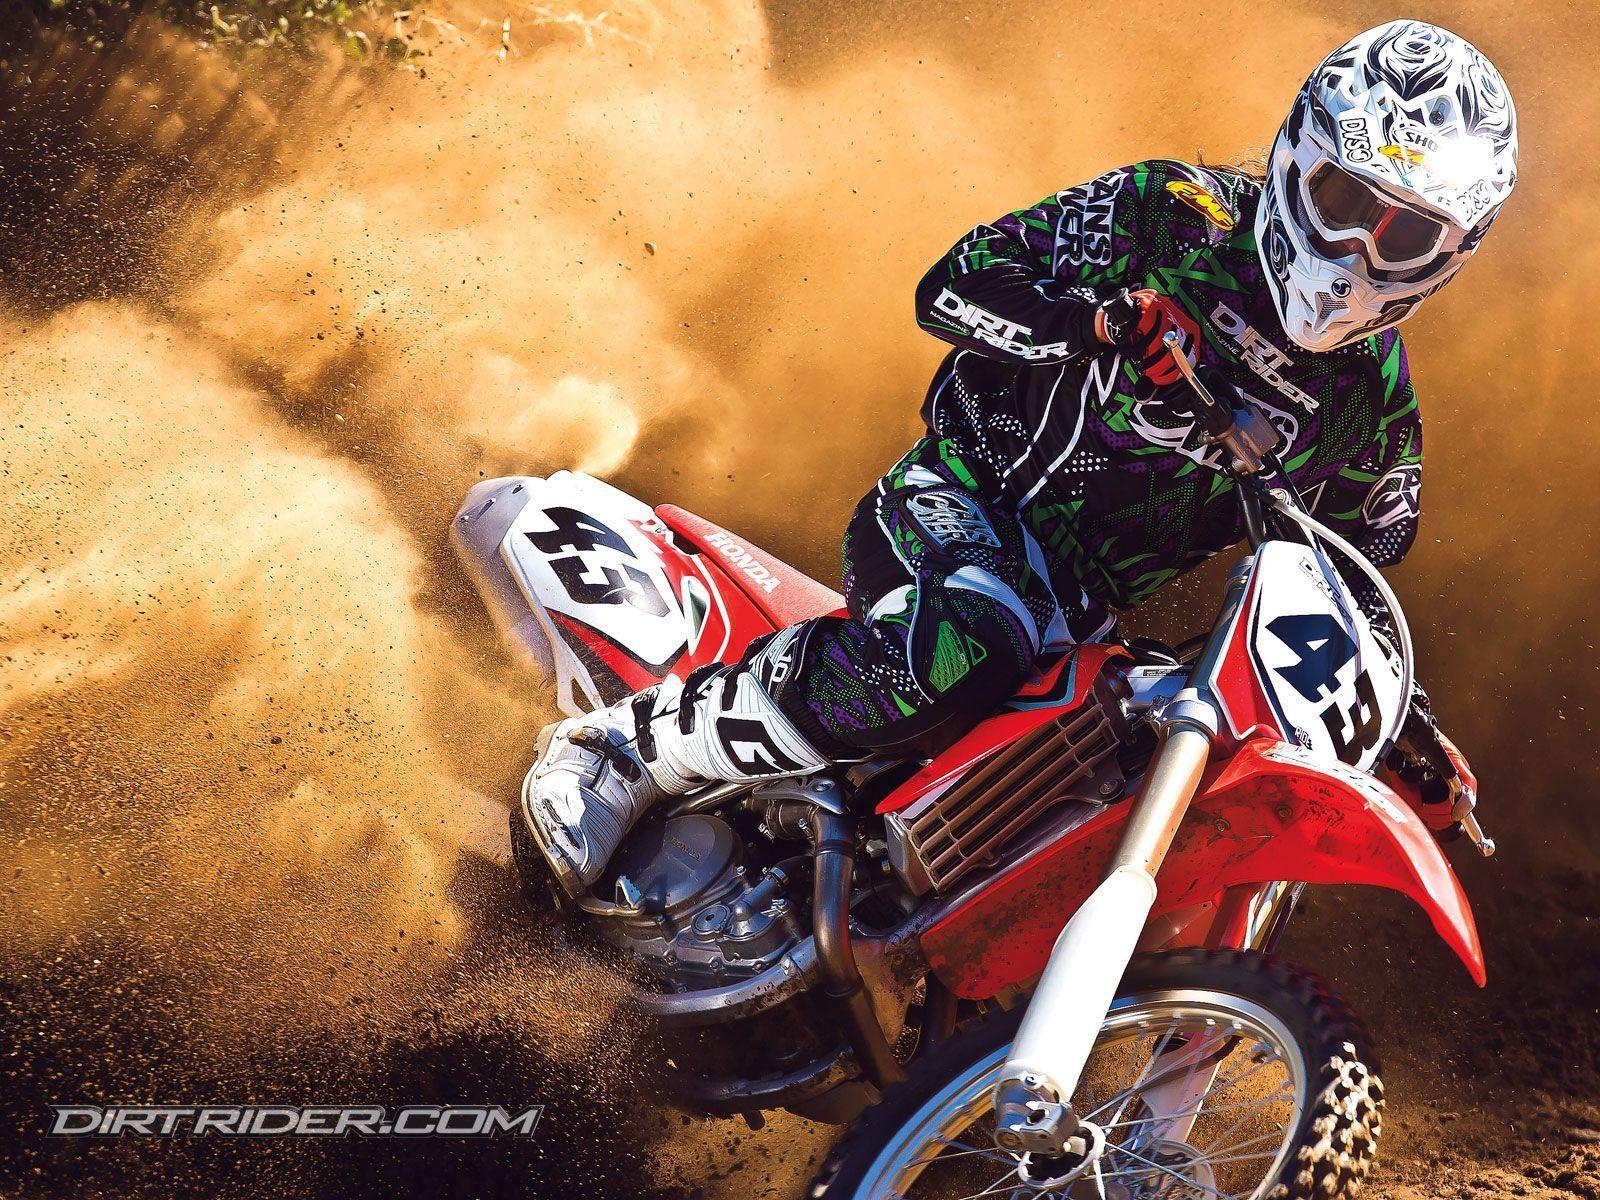 1280x1024 Honda Motocross Wallpapers Group 73